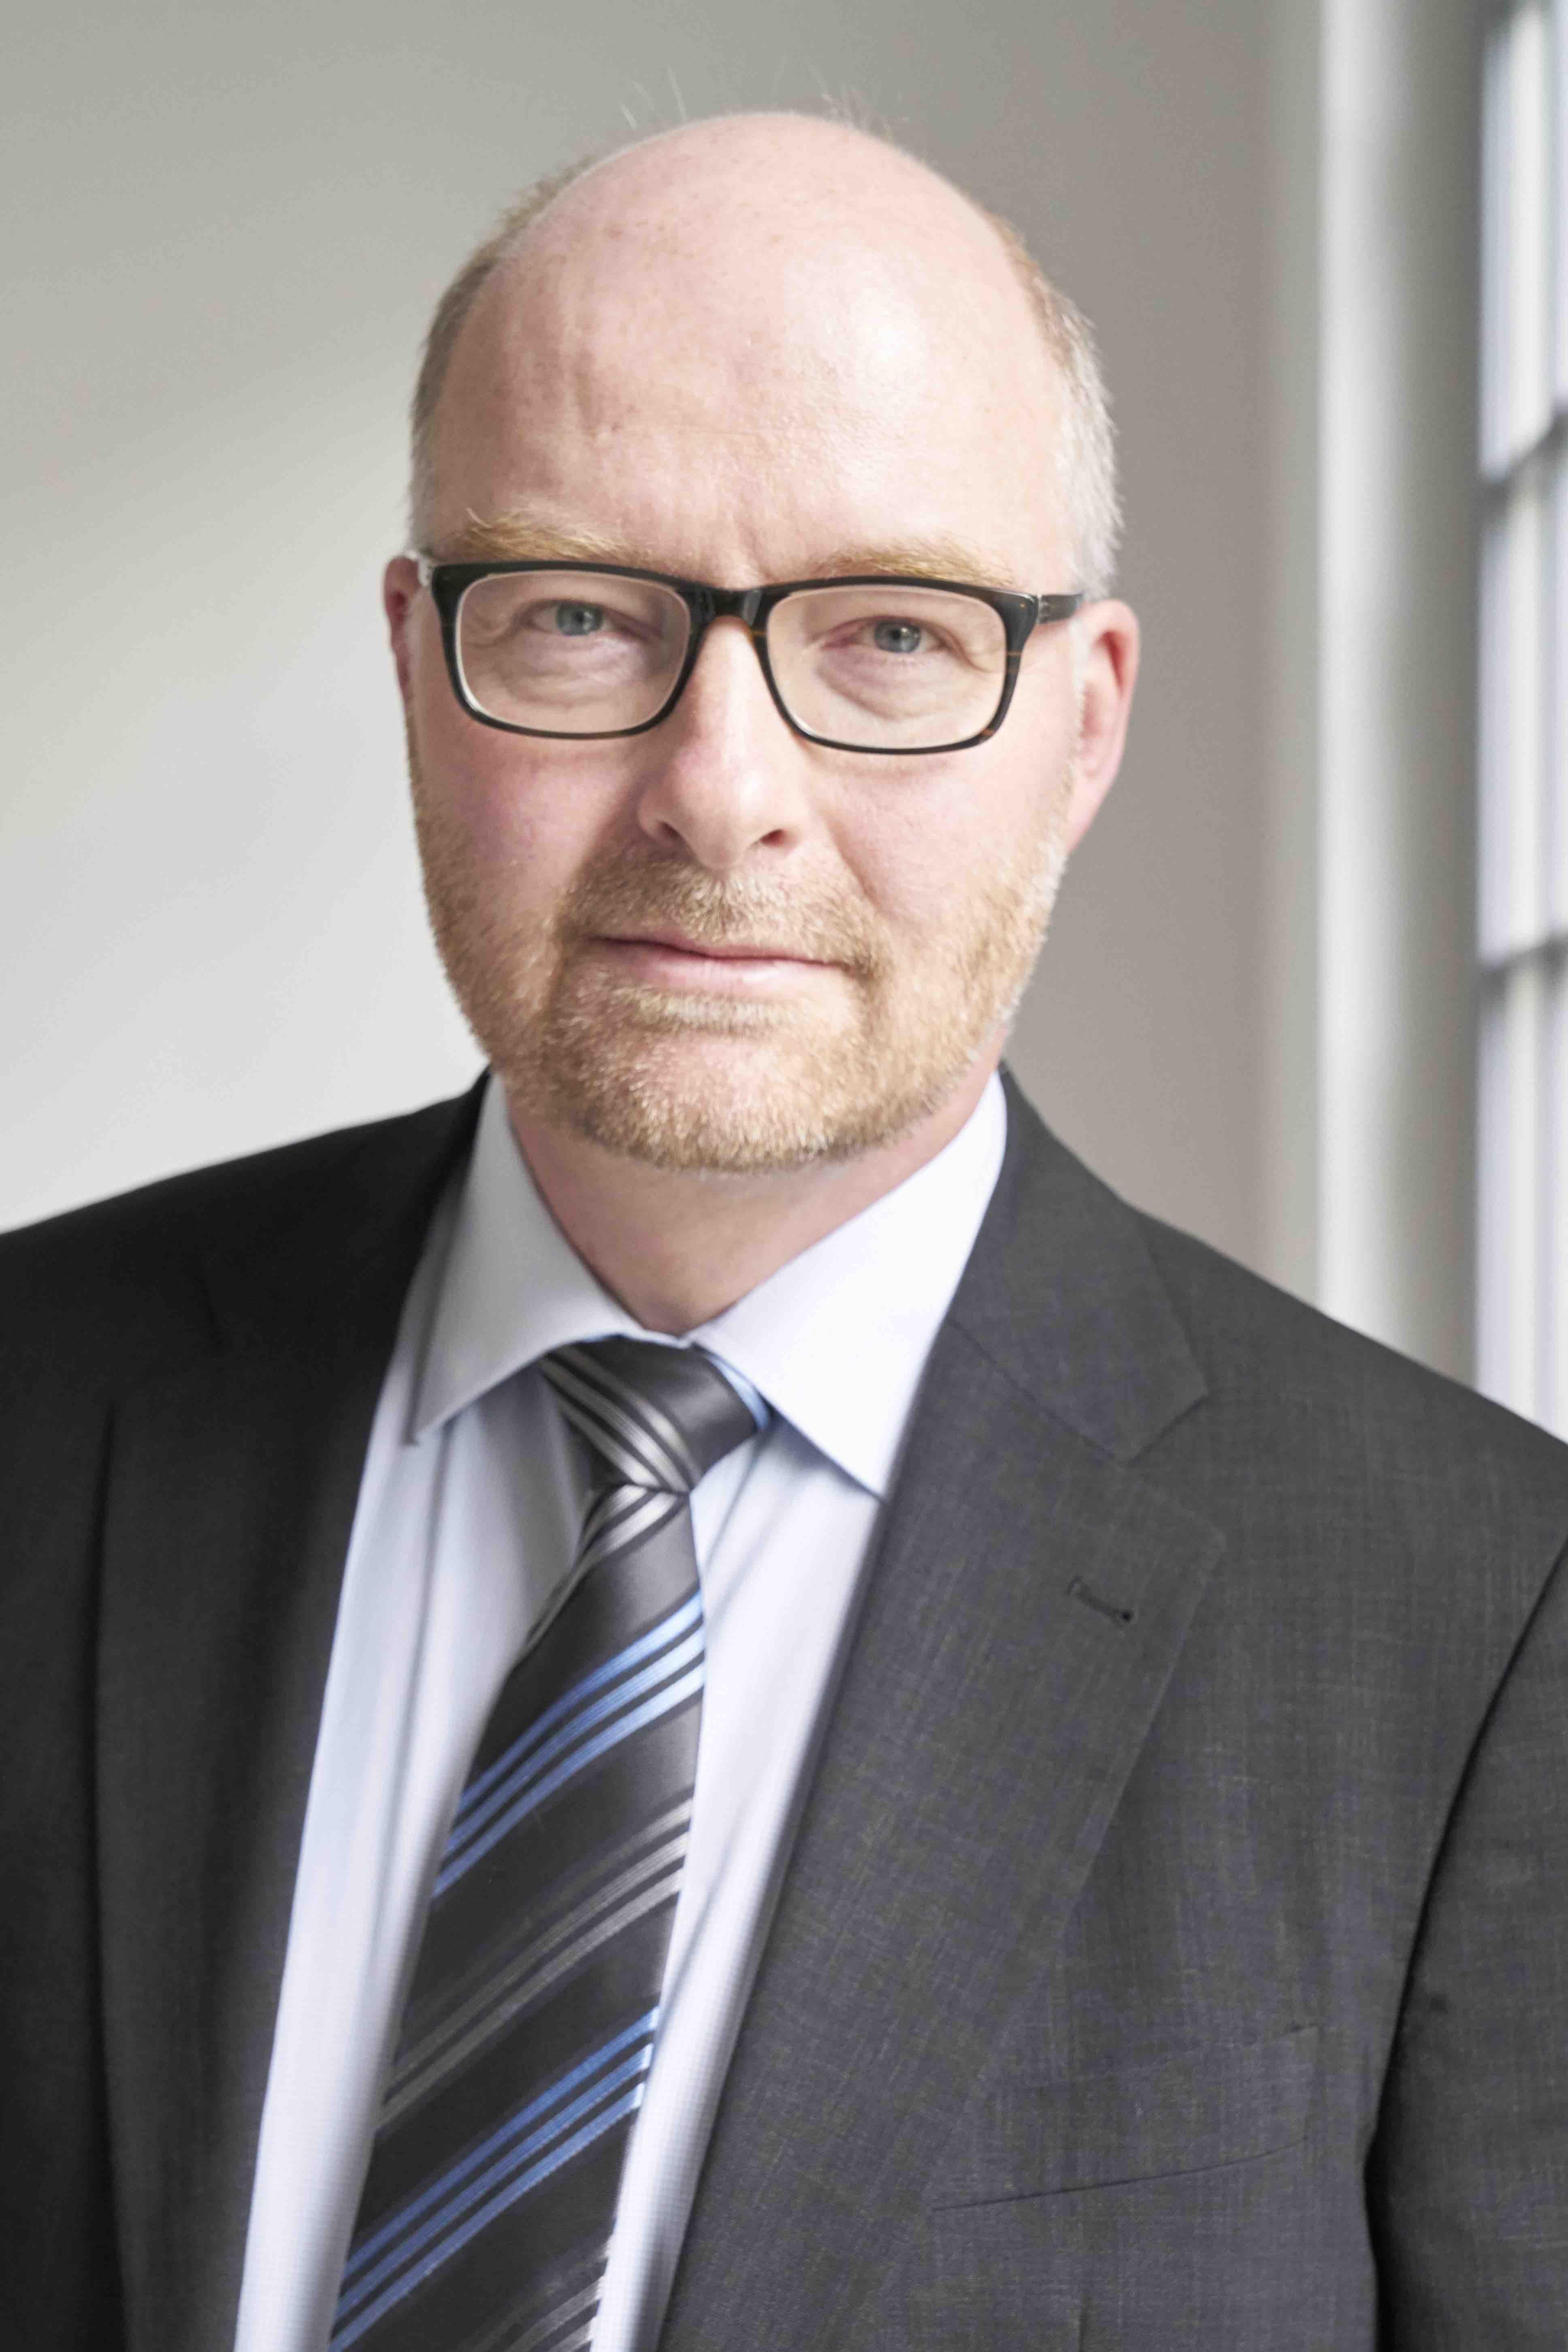 Carsten Hansen ist Leiter Innenstadtlogistik beim Bundesverband Paket & Expresslogistik e. V.